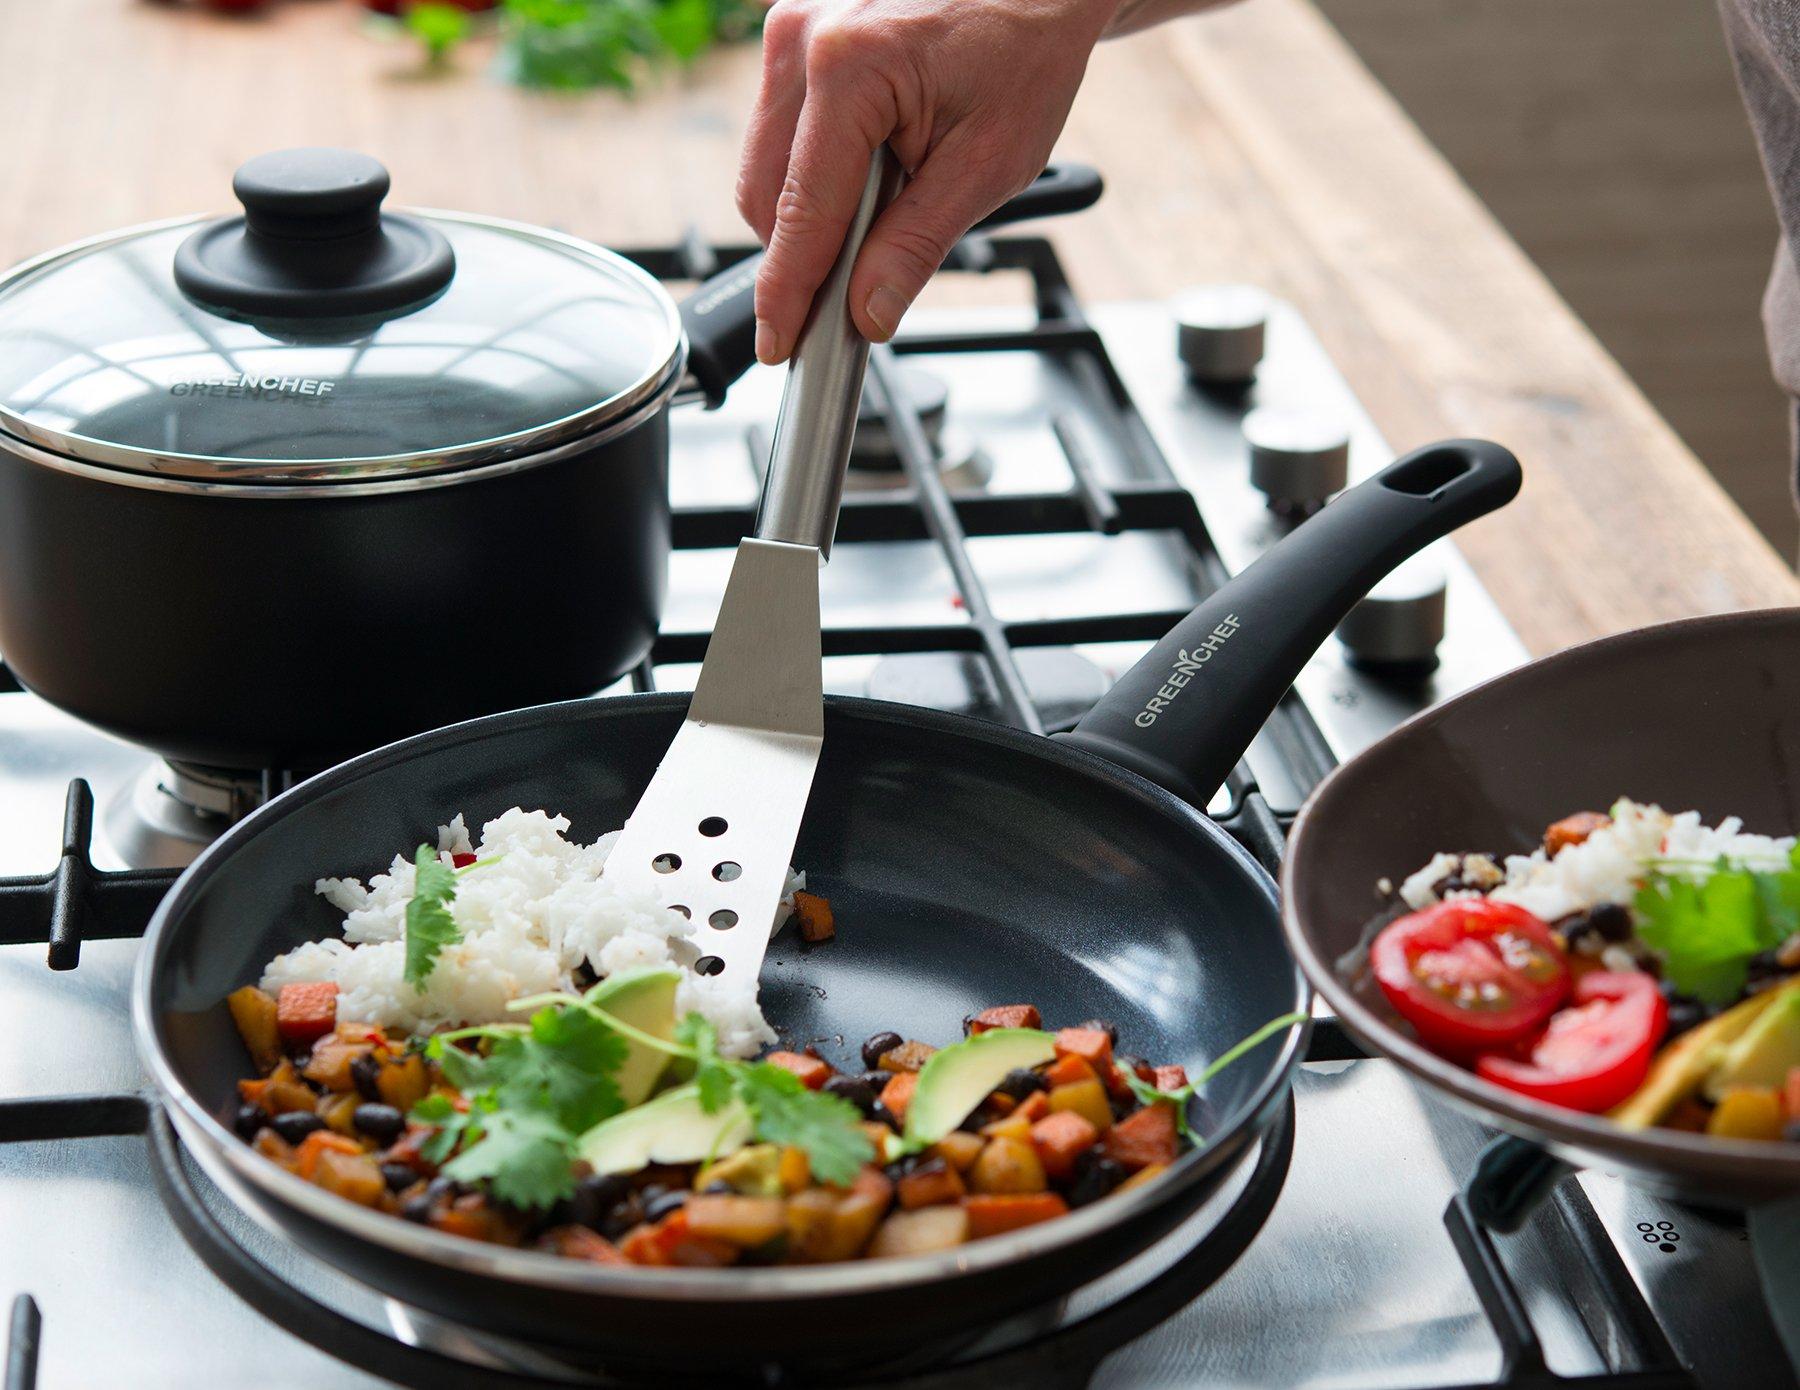 GreenChef CW002482-002 Soft Grip Frying Pan, Aluminium, Black